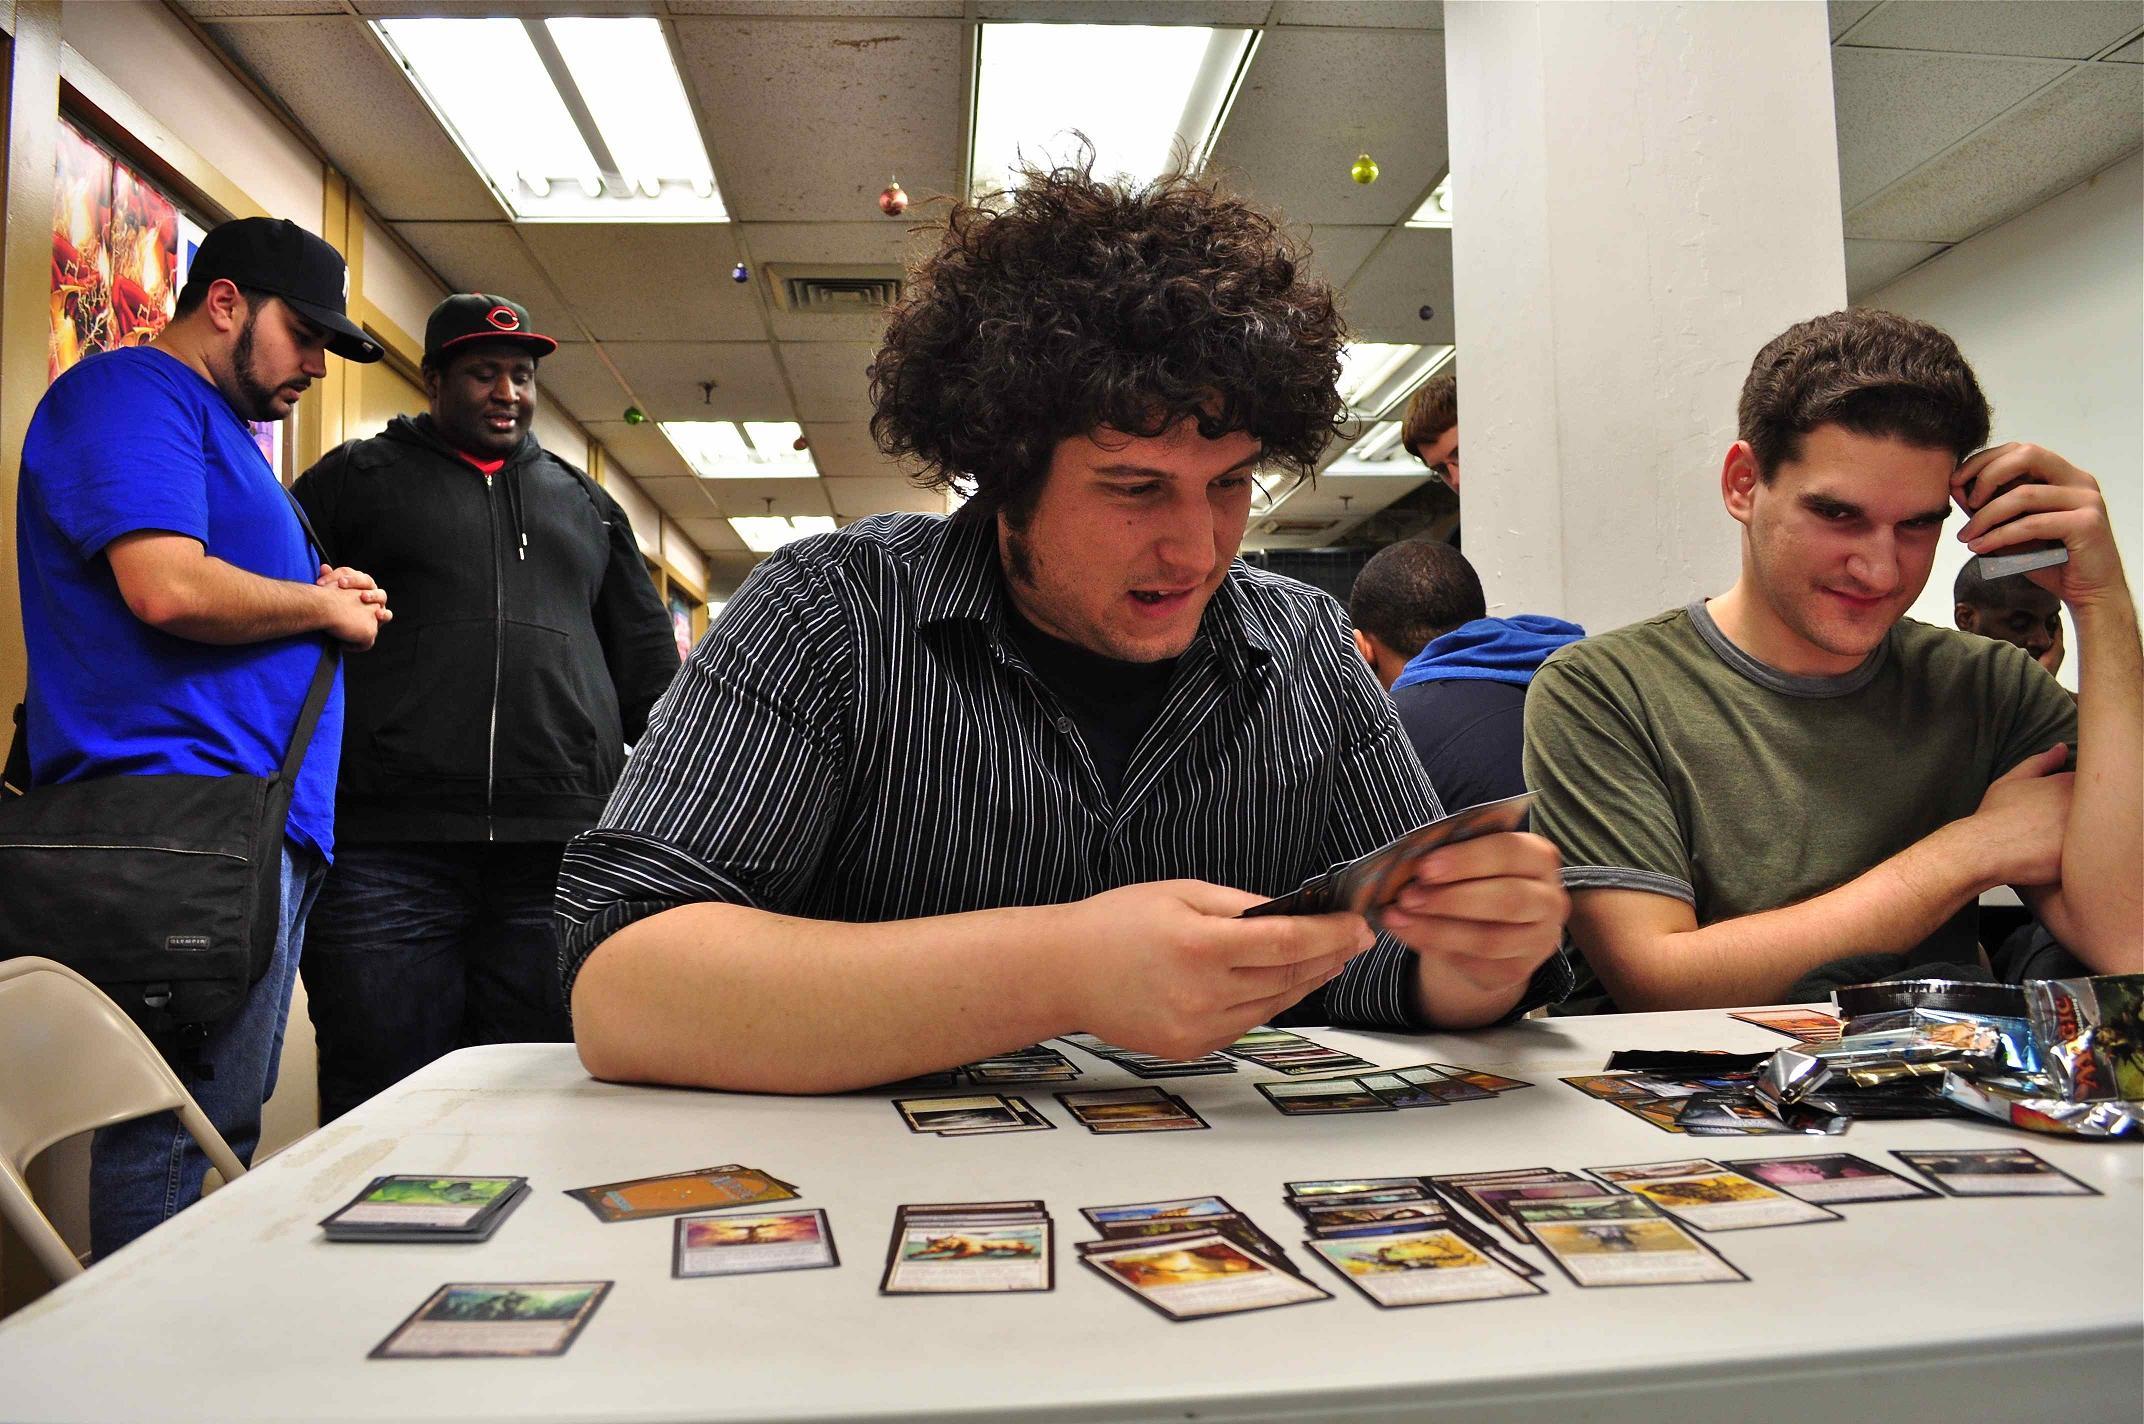 Dan Foster, 25,  contemplates his next move.